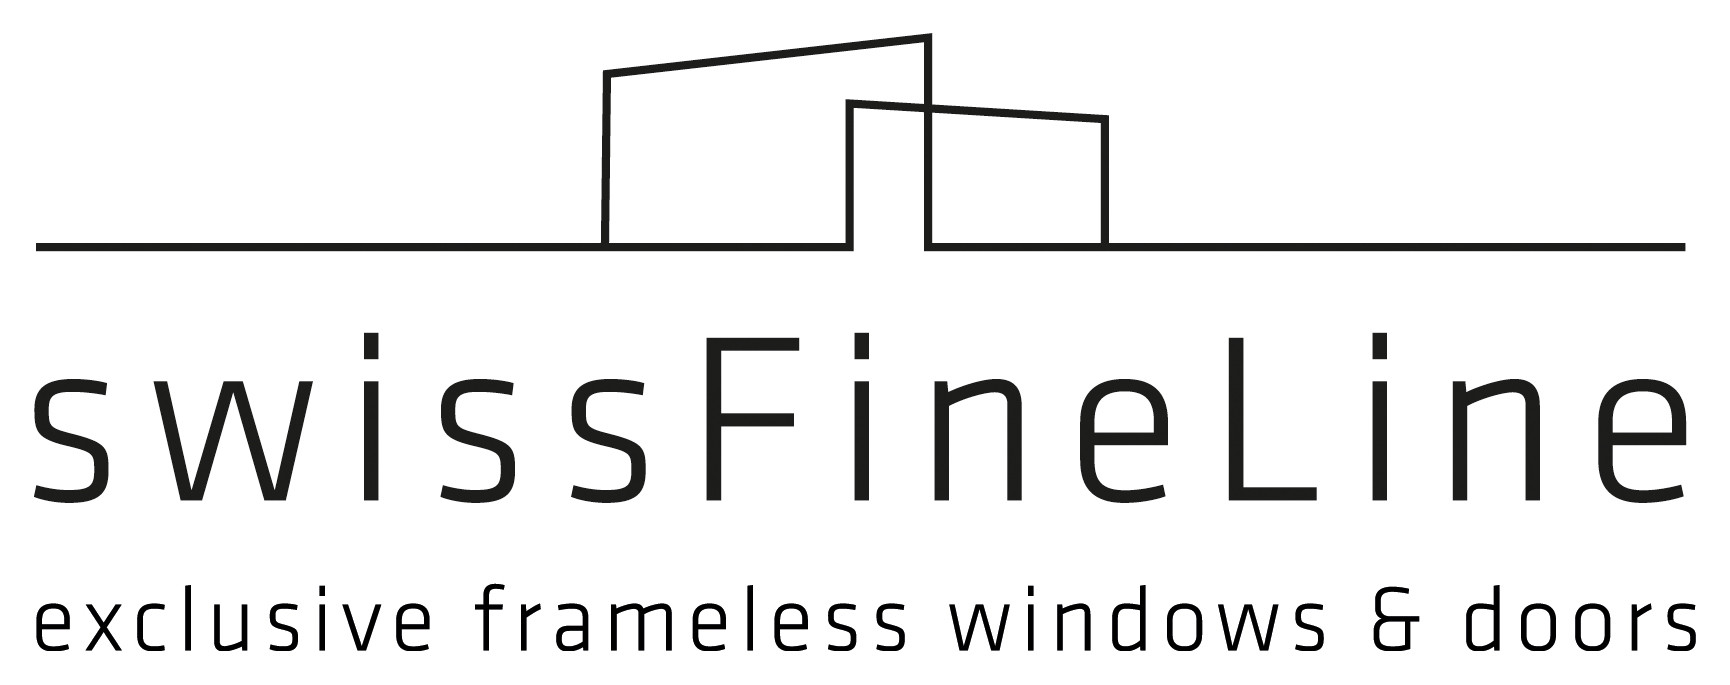 swissFineLine